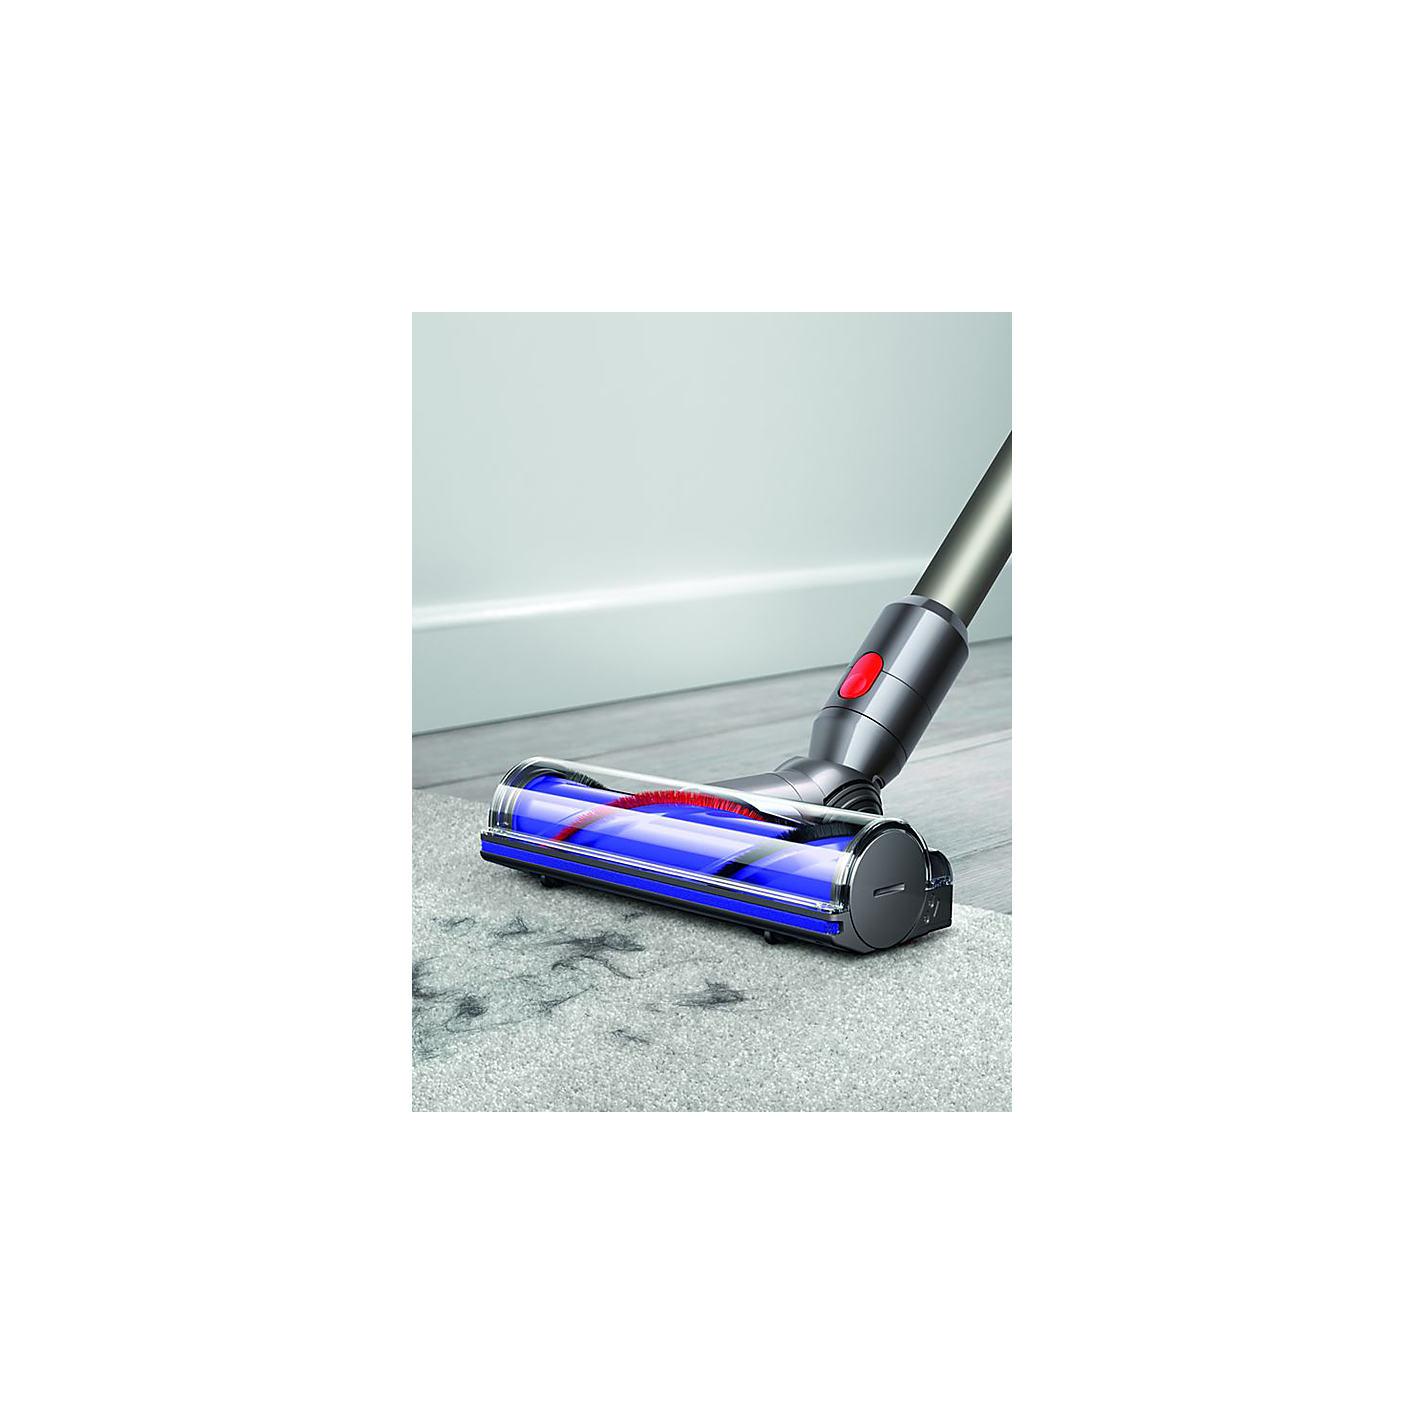 buy dyson v8 animal cordless vacuum cleaner online at - Cordless Vacuum Cleaner